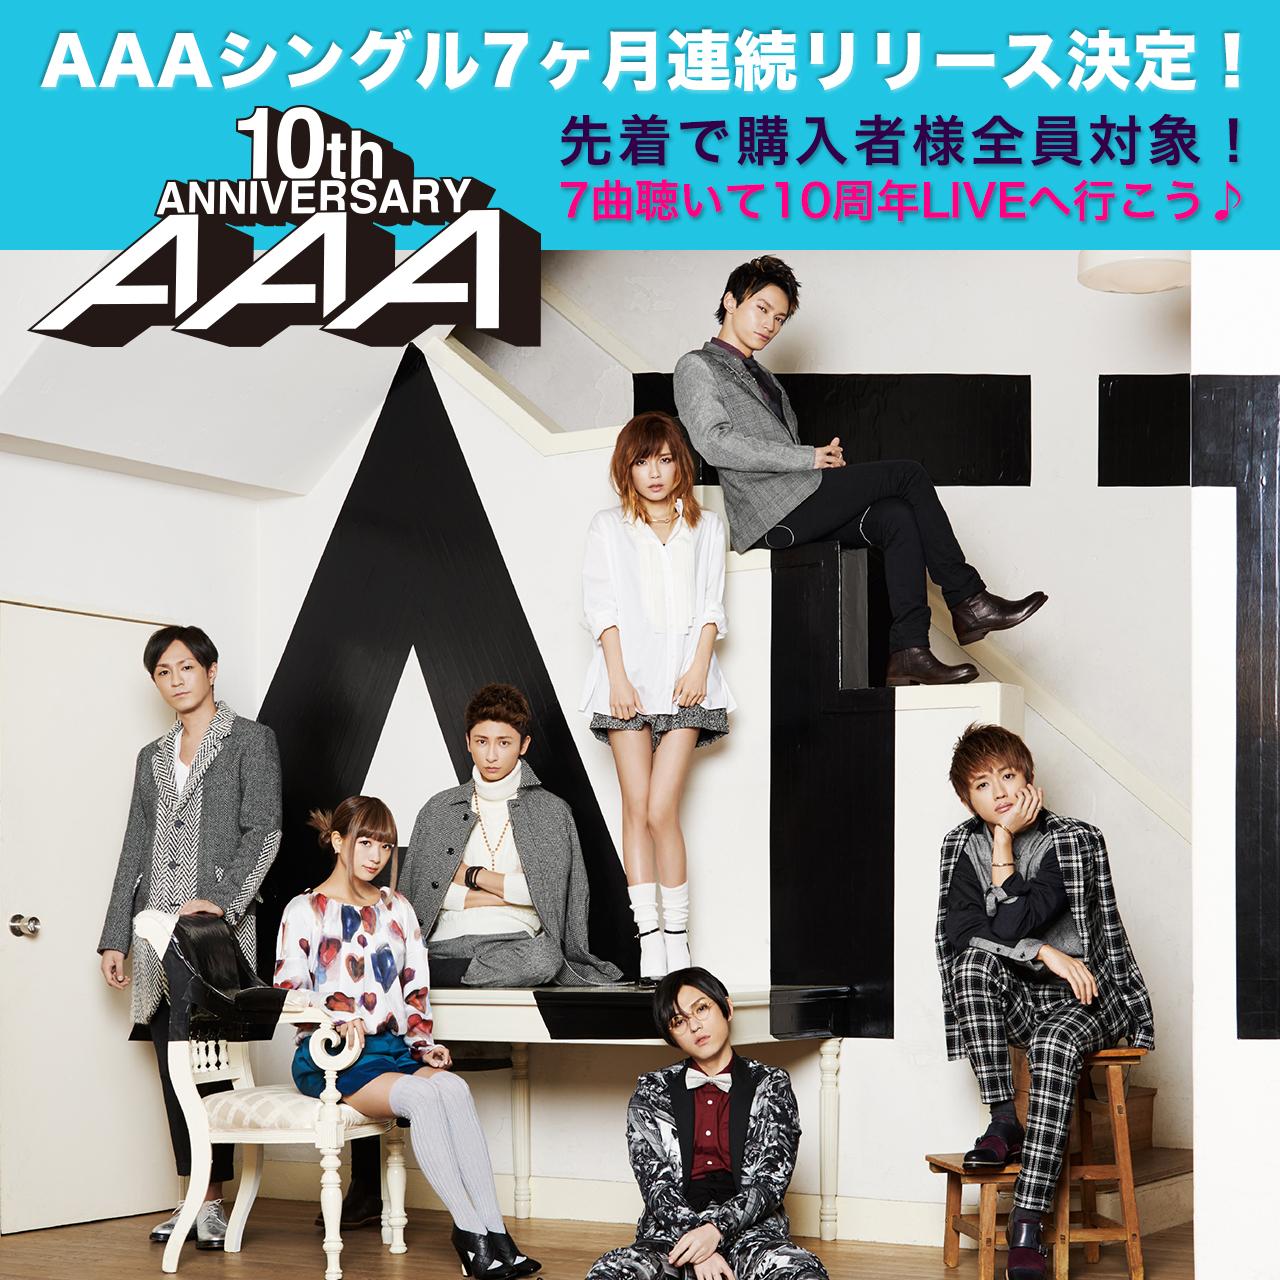 AAAシングル7ヶ月連続リリース決定!先着で購入者様全員対象!7曲聴いて10周年LIVEへ行こう♪